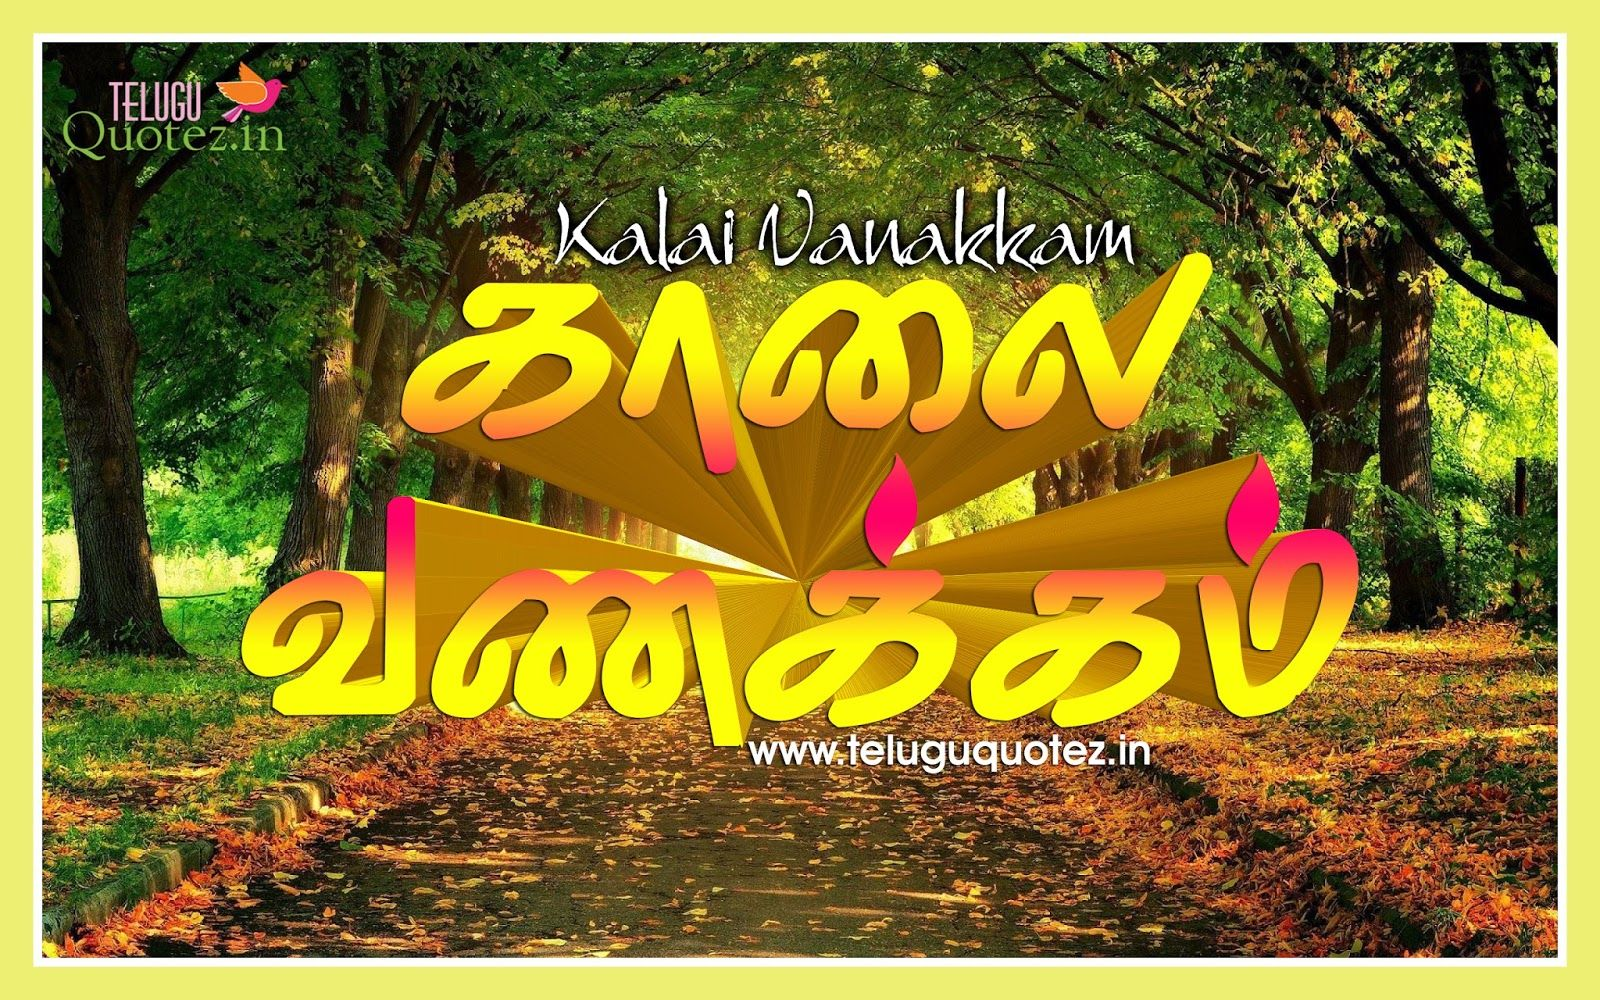 Good Morning Quotes Wallpapers In Tamil Kalai Vanakkam Tamil